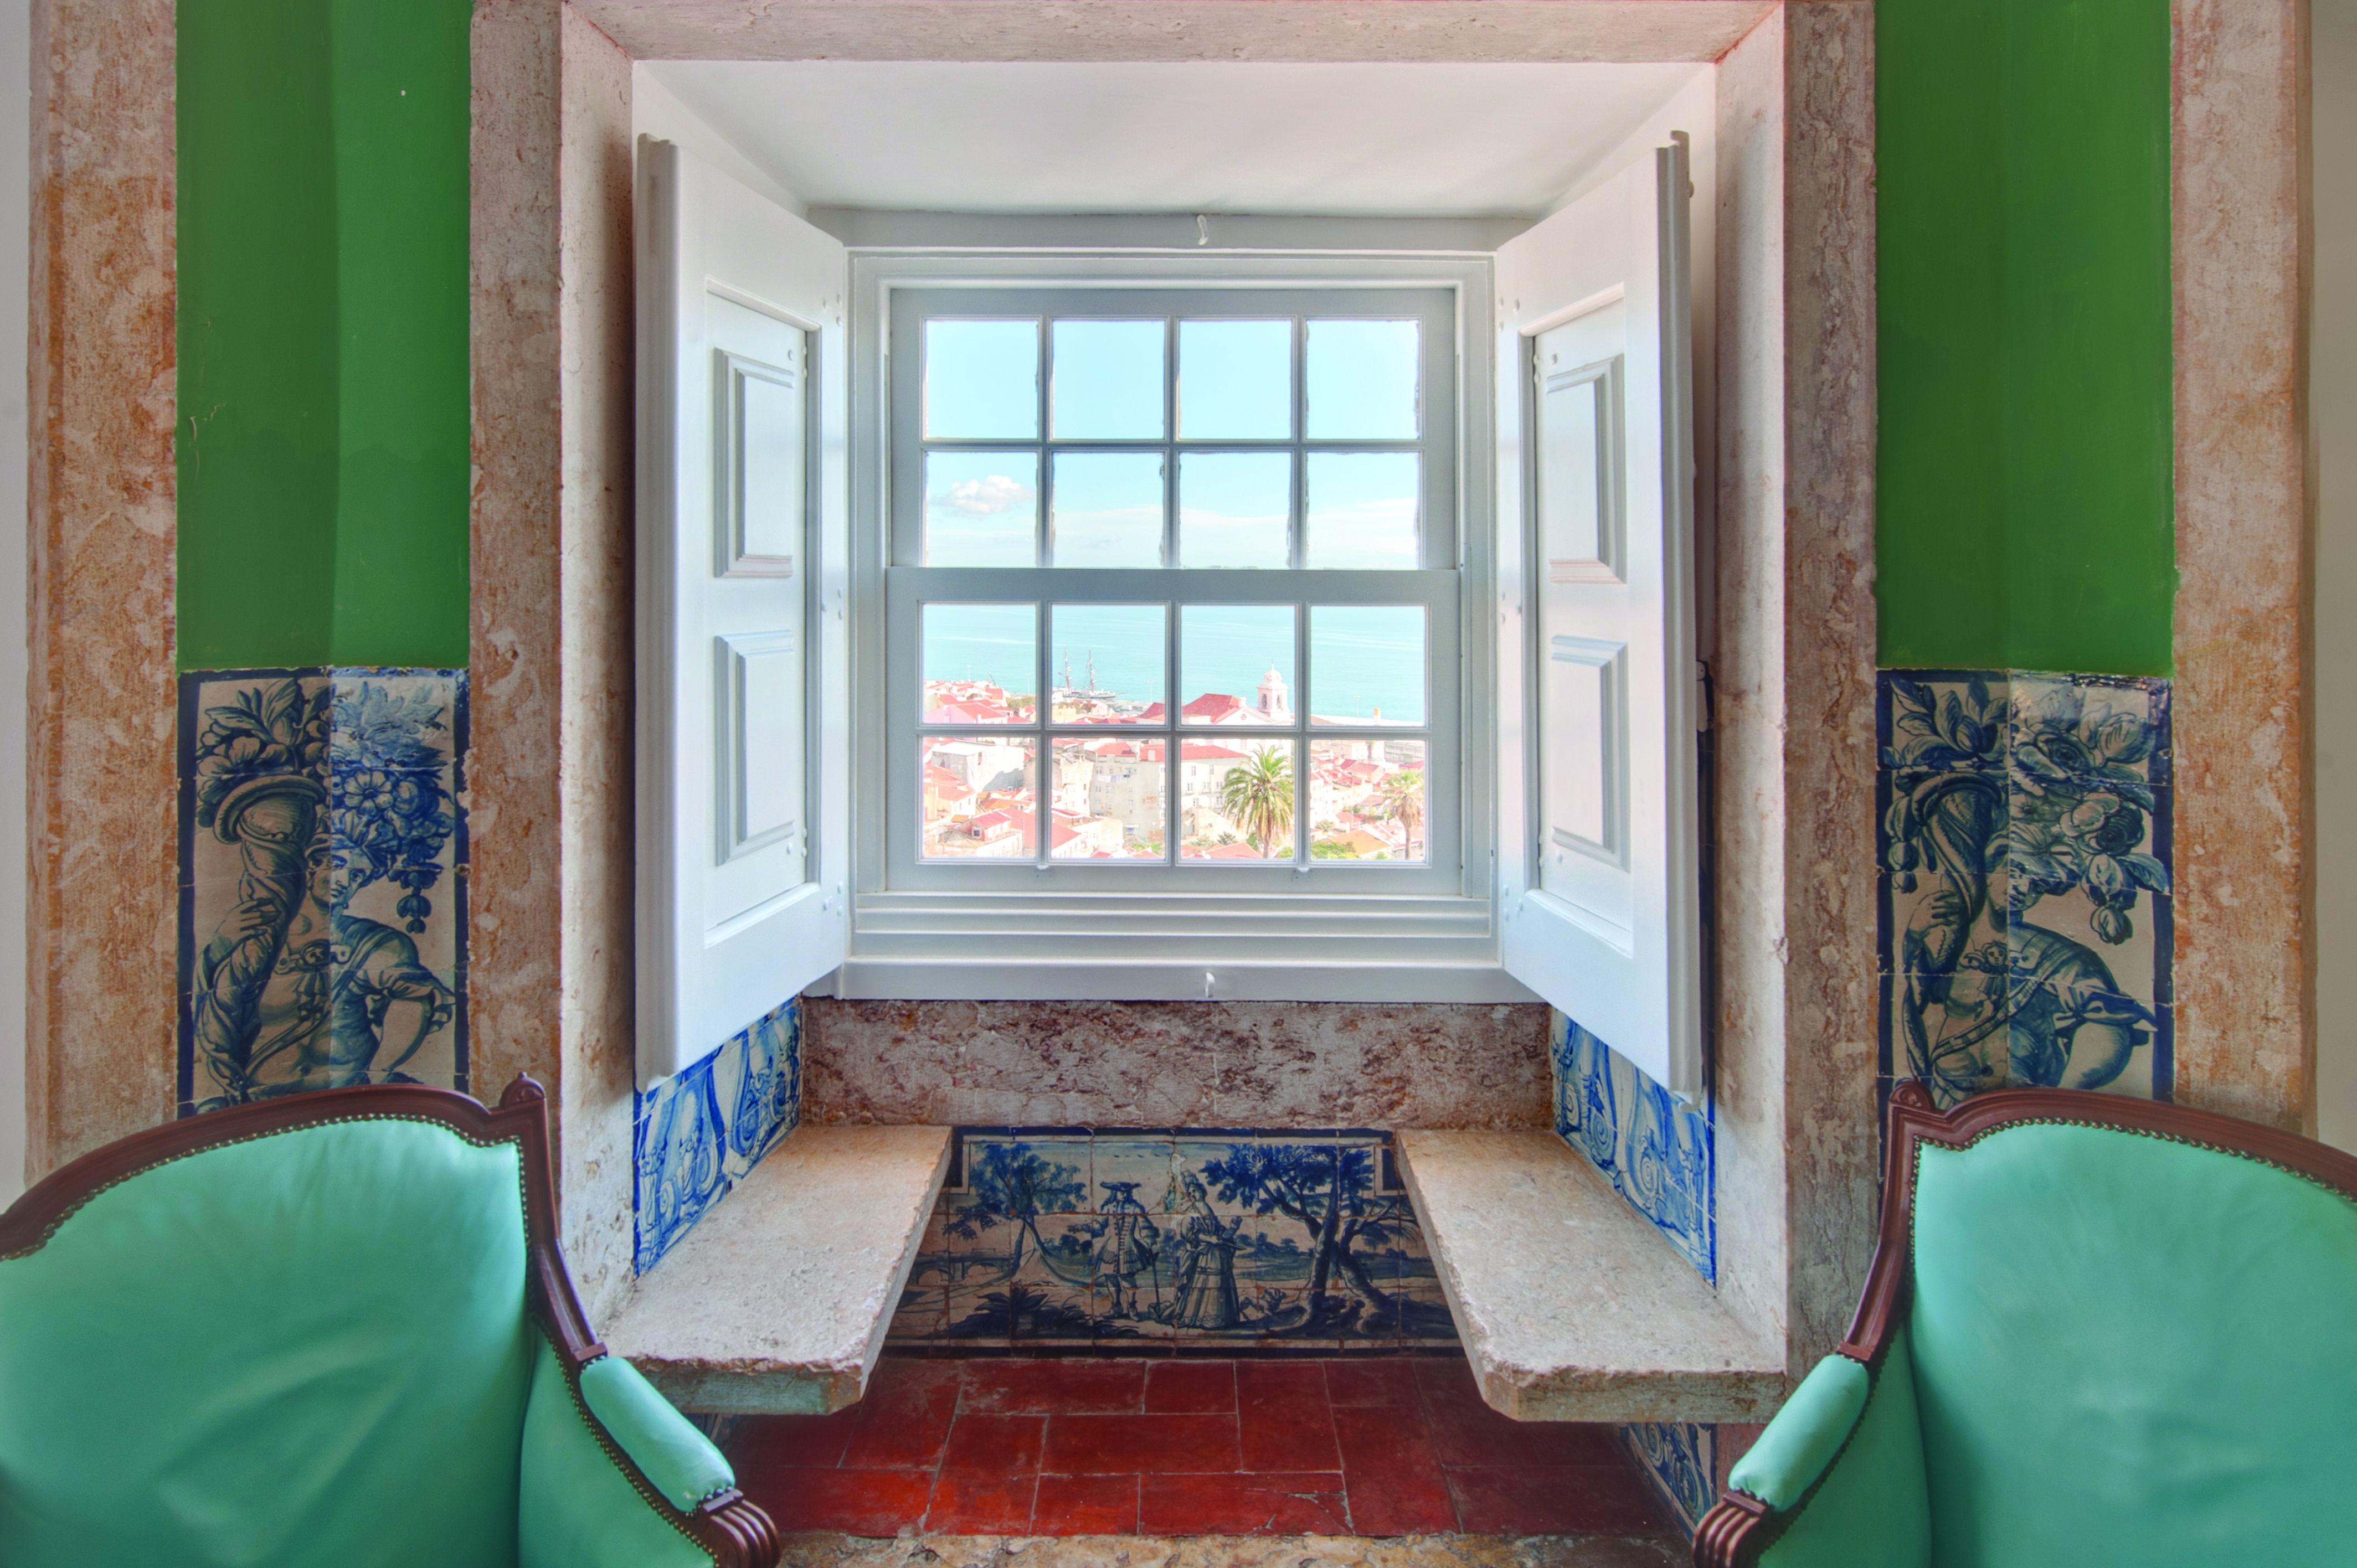 Palacio Belmonte 5a BGusmao living - Joe Condron #Lisbon #PalacioBelmonte #LuxuryHotels #TravelPortugal